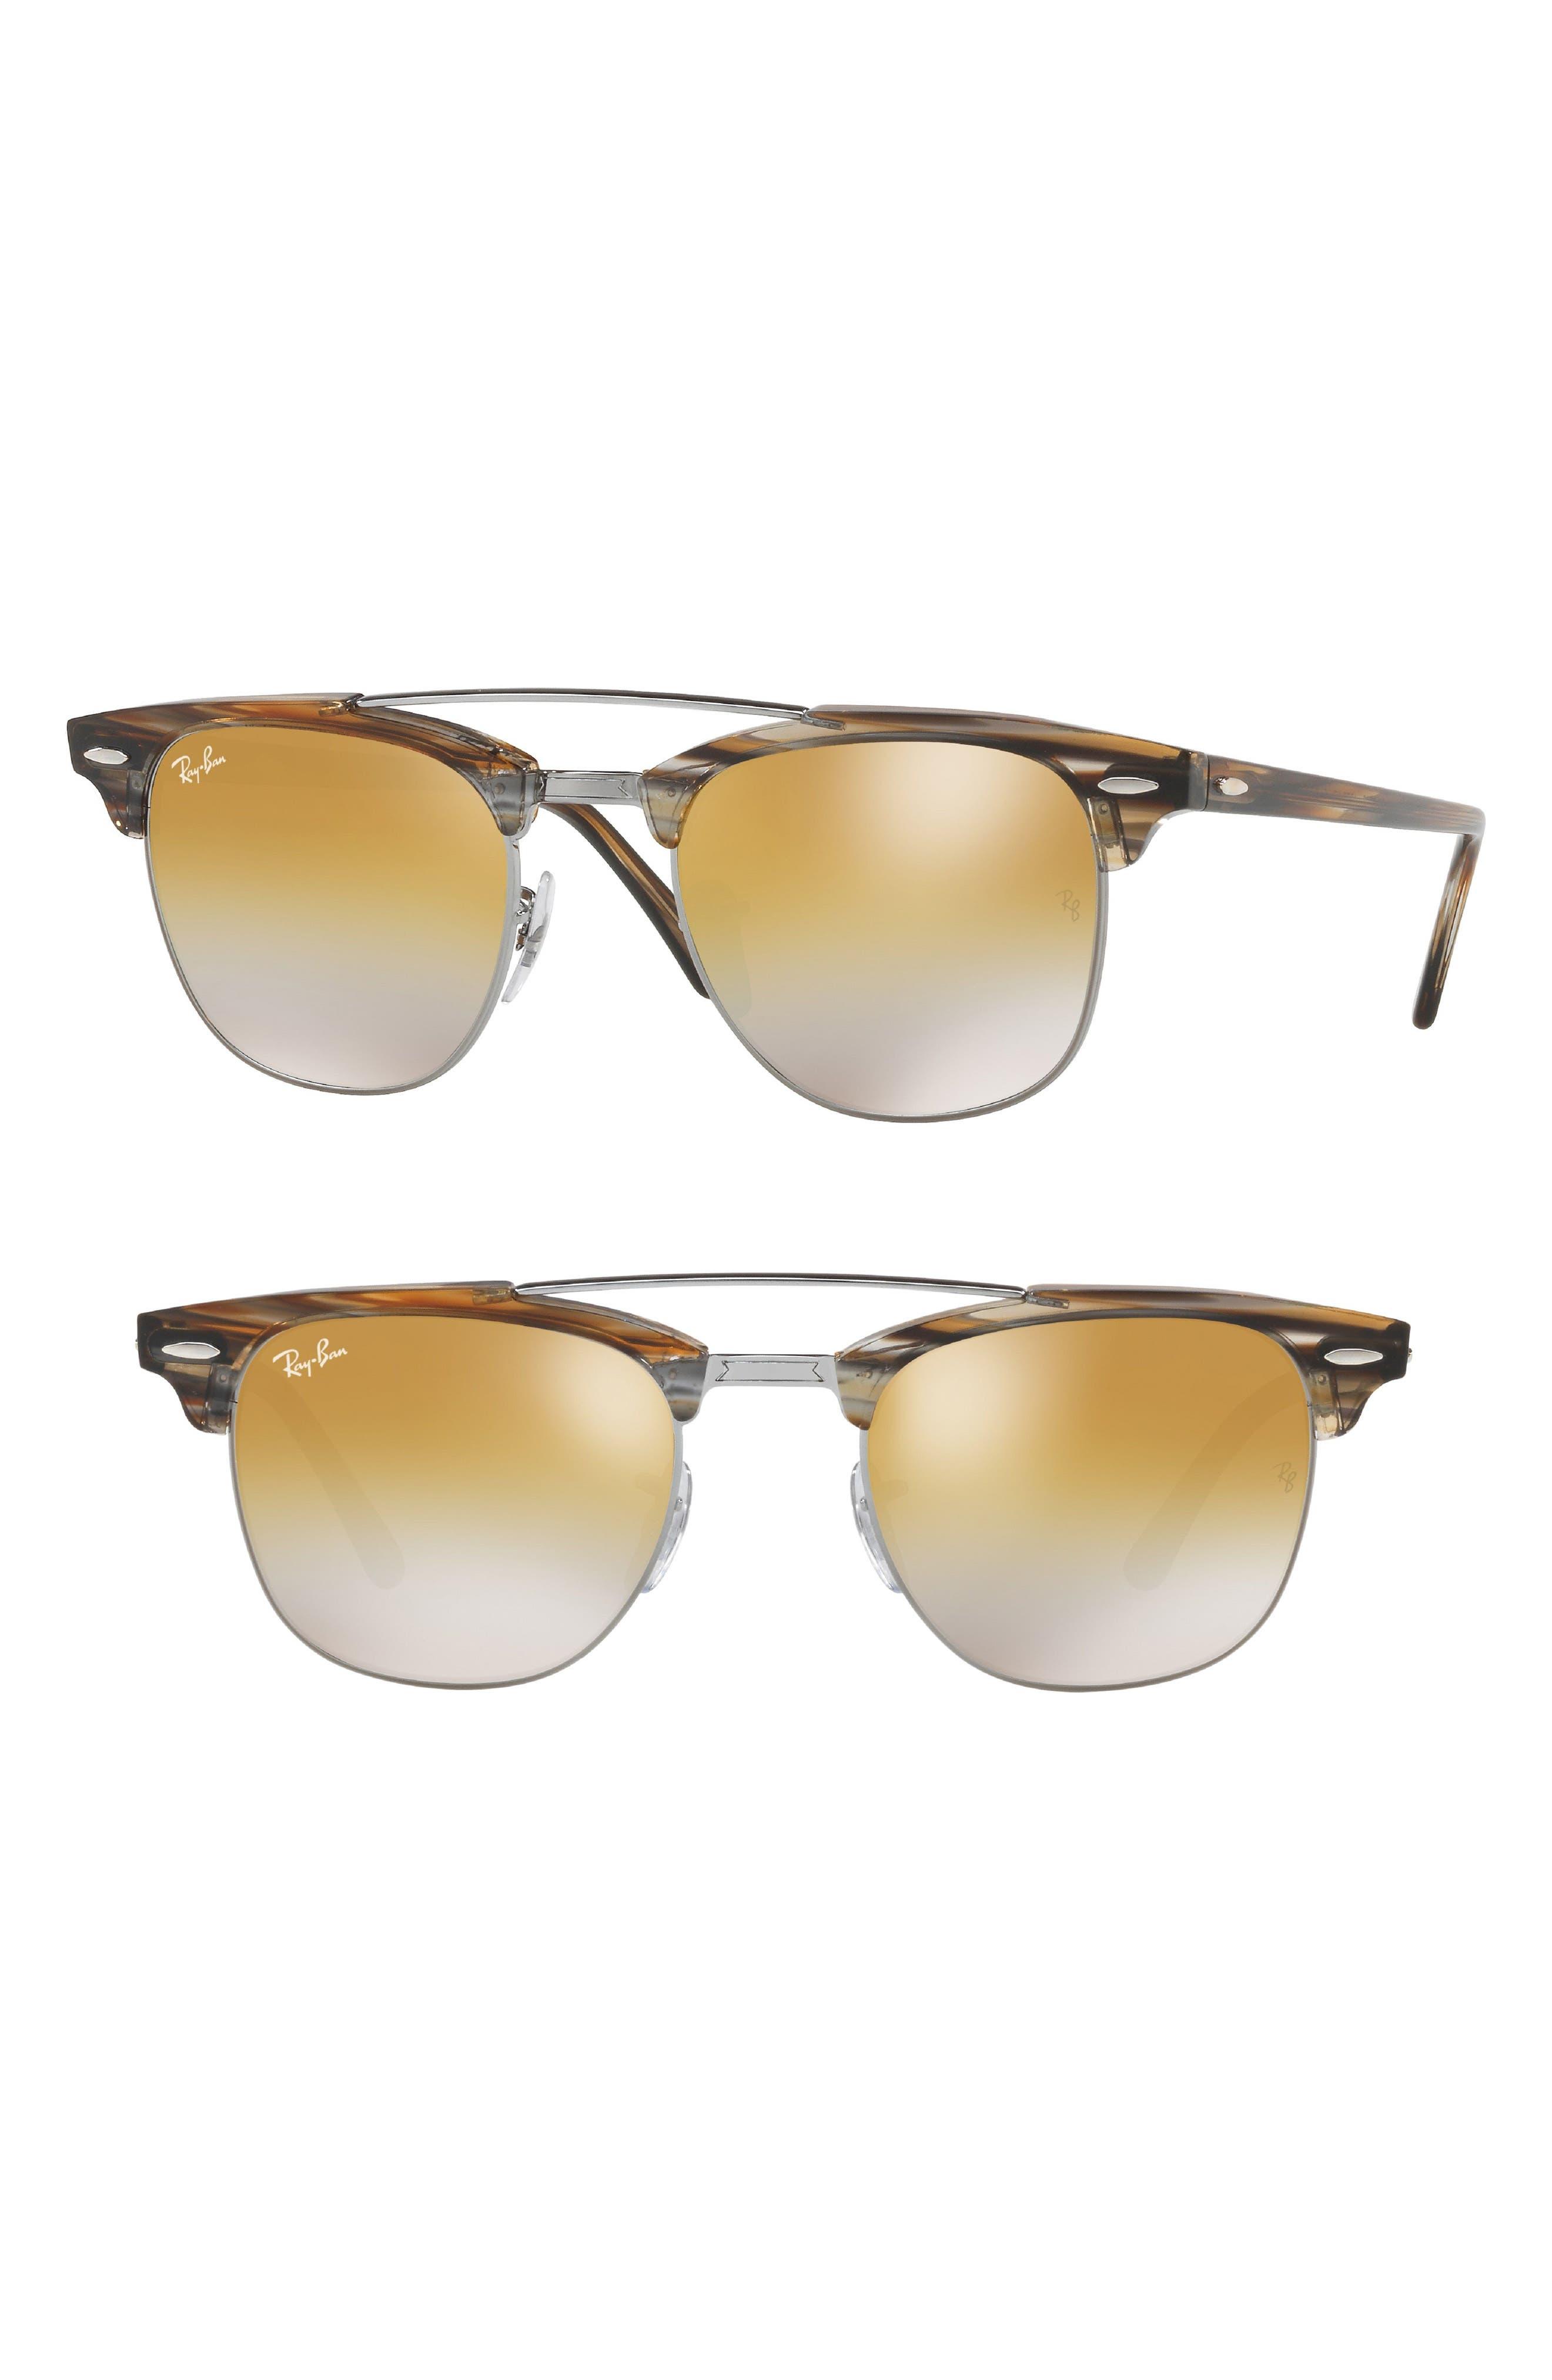 51mm Gradient Mirrored Sunglasses,                             Main thumbnail 1, color,                             Gunmetal